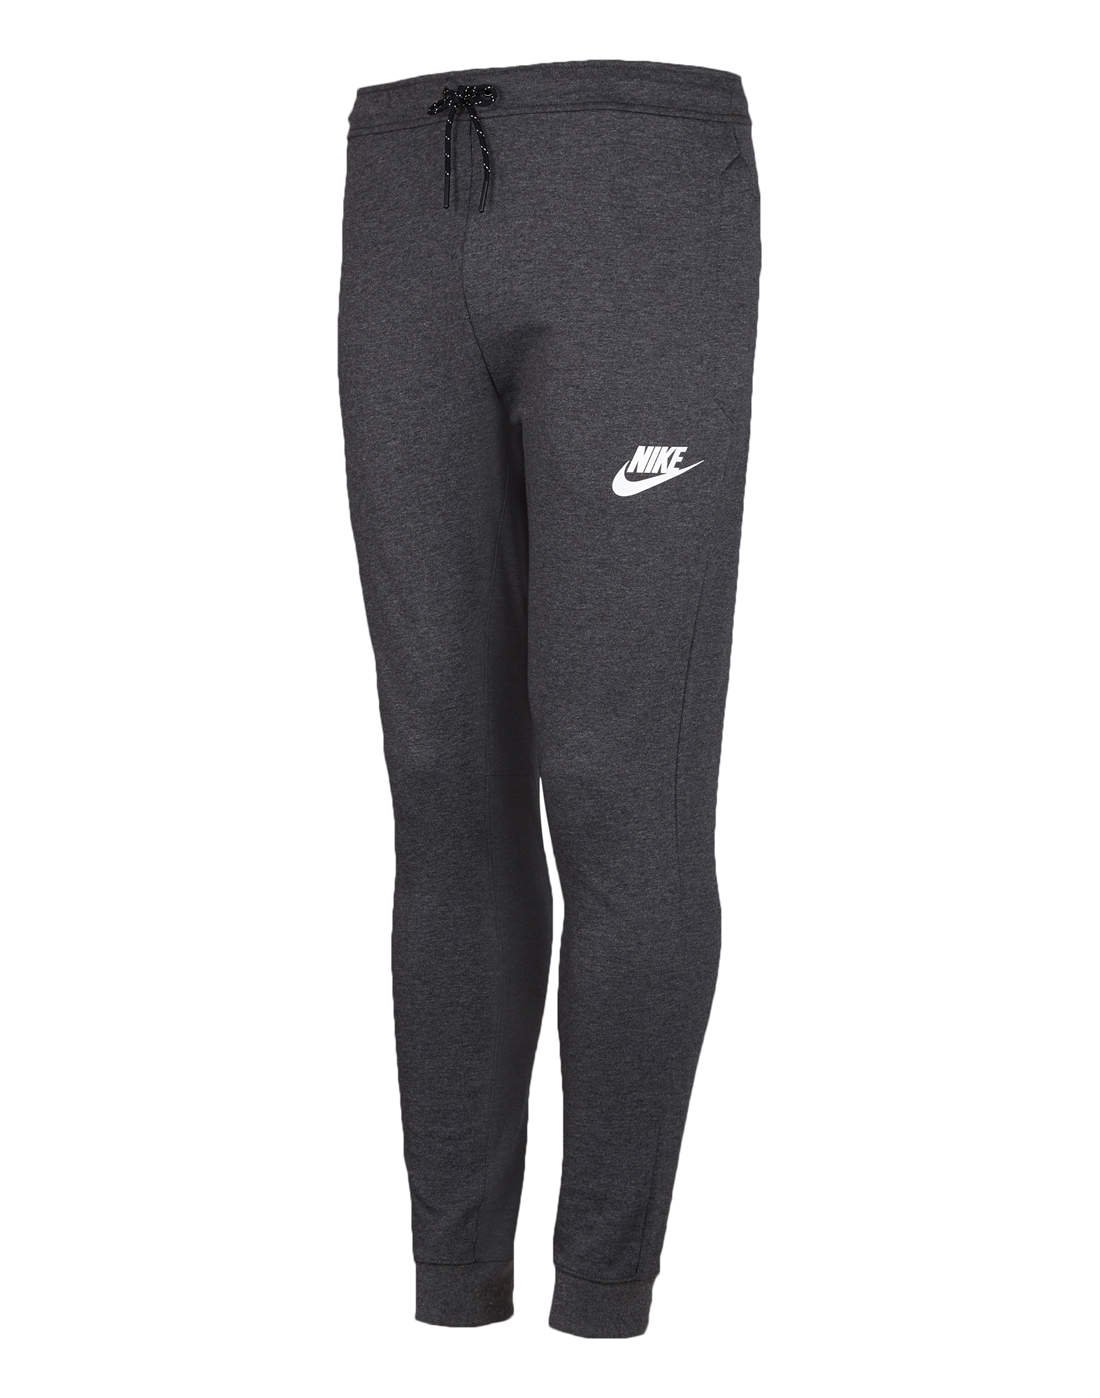 23480a5f31e4 Men s Nike AV15 Joggers